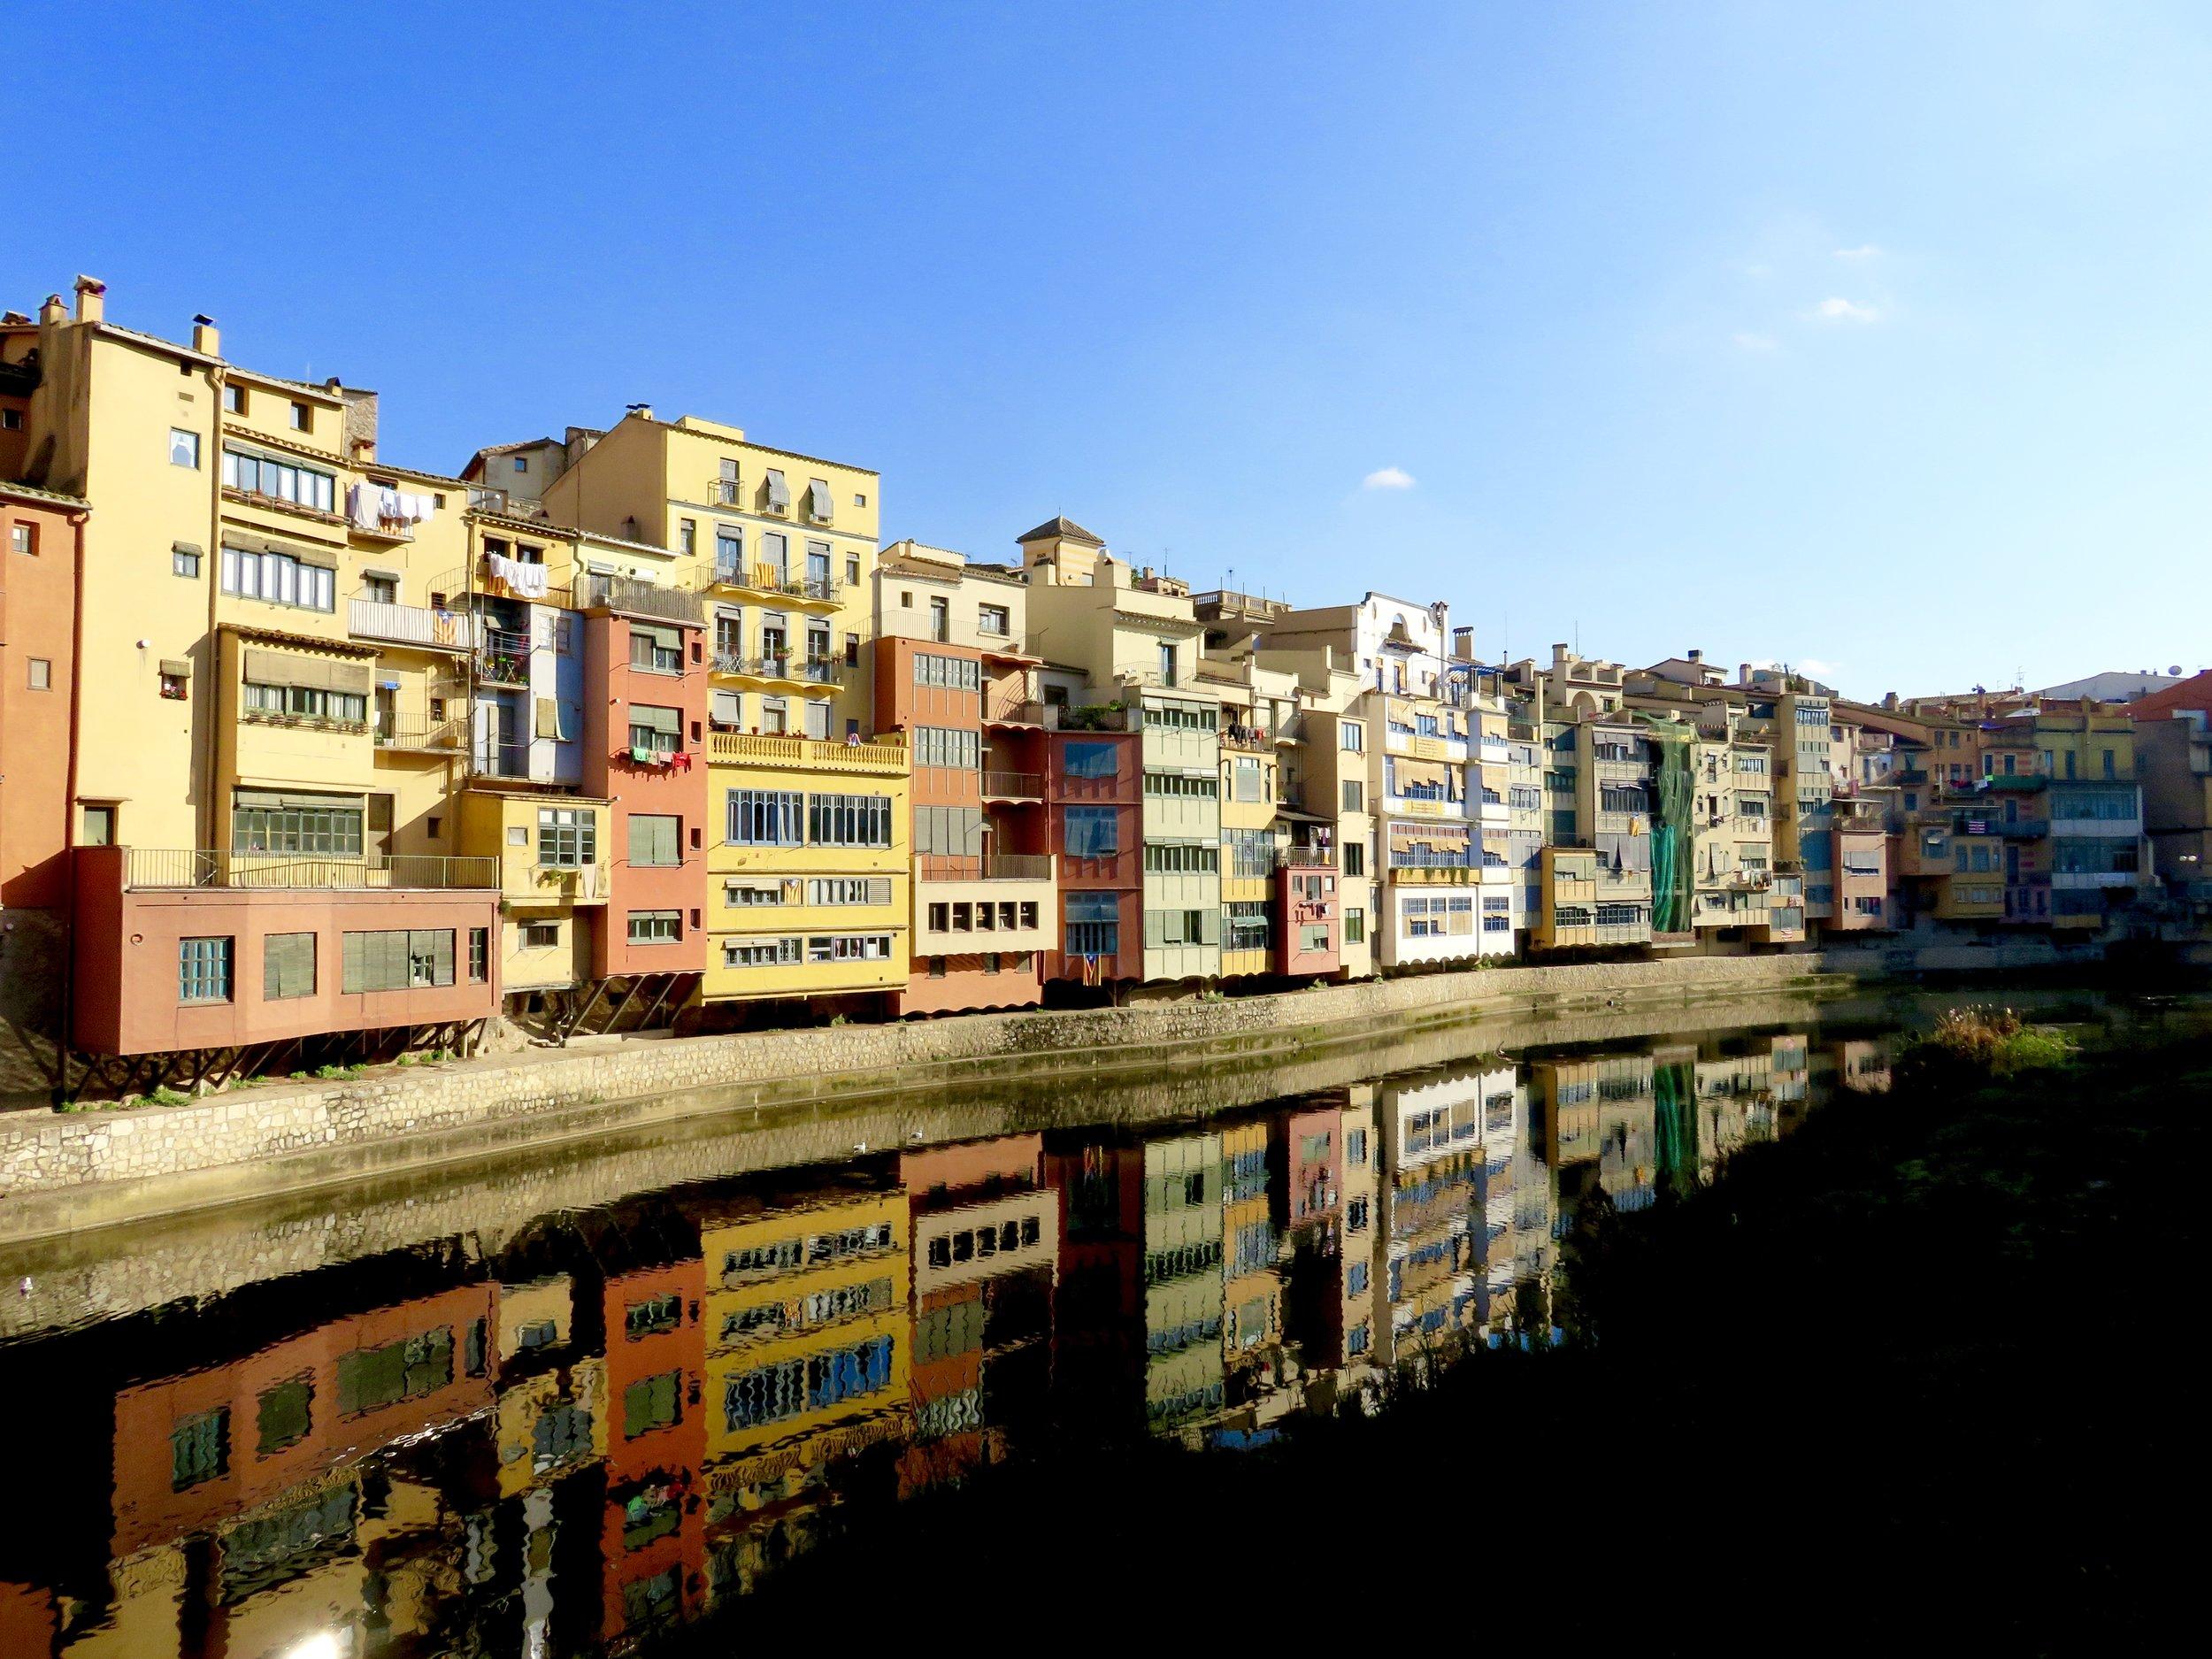 Girona on the River Onyar, Spain